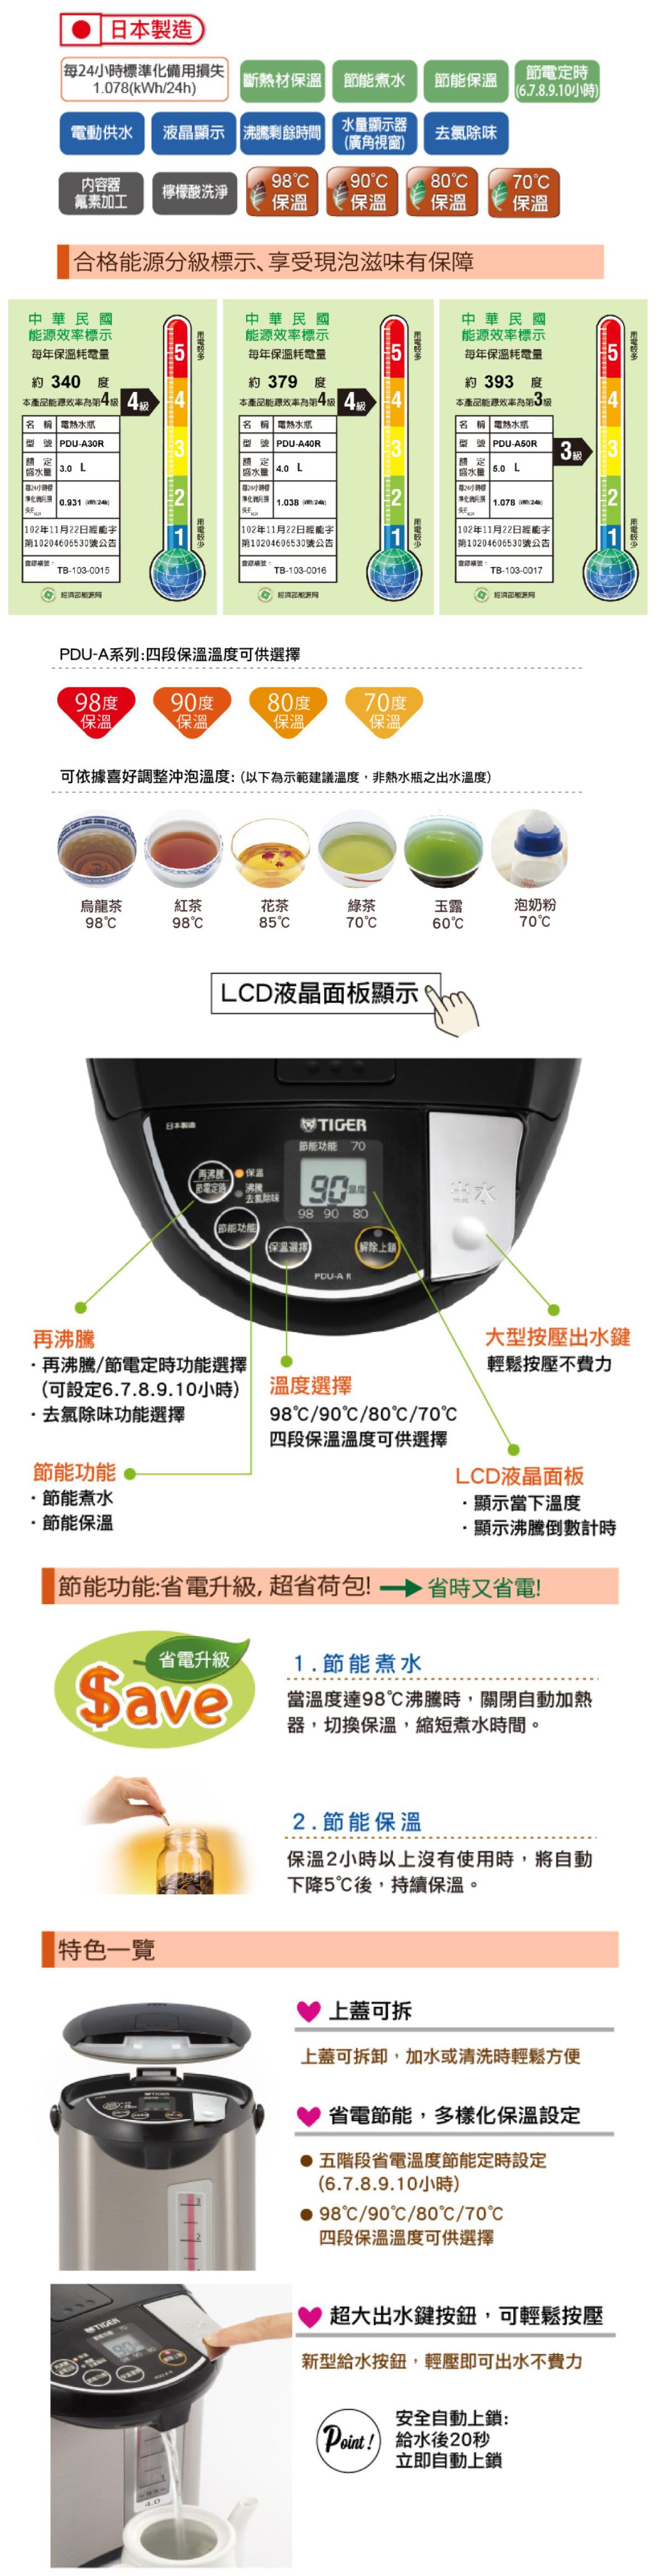 TIGER 虎牌 PDU-A50R 5.0L微電腦大按鈕熱水瓶